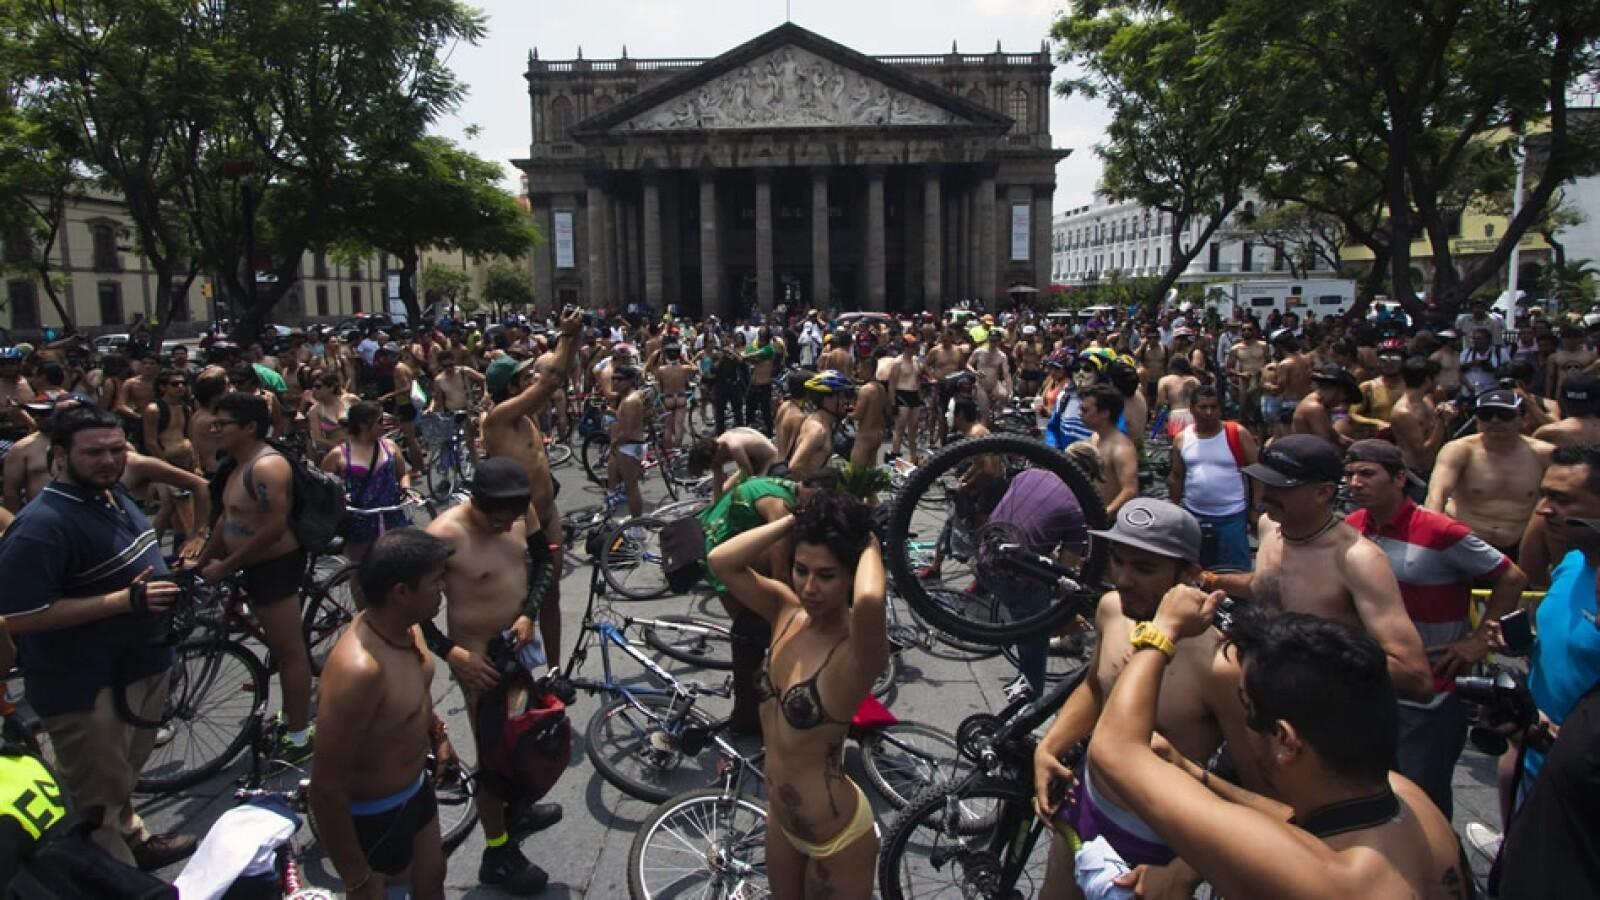 Rodada ciclista al desnudo México 2014